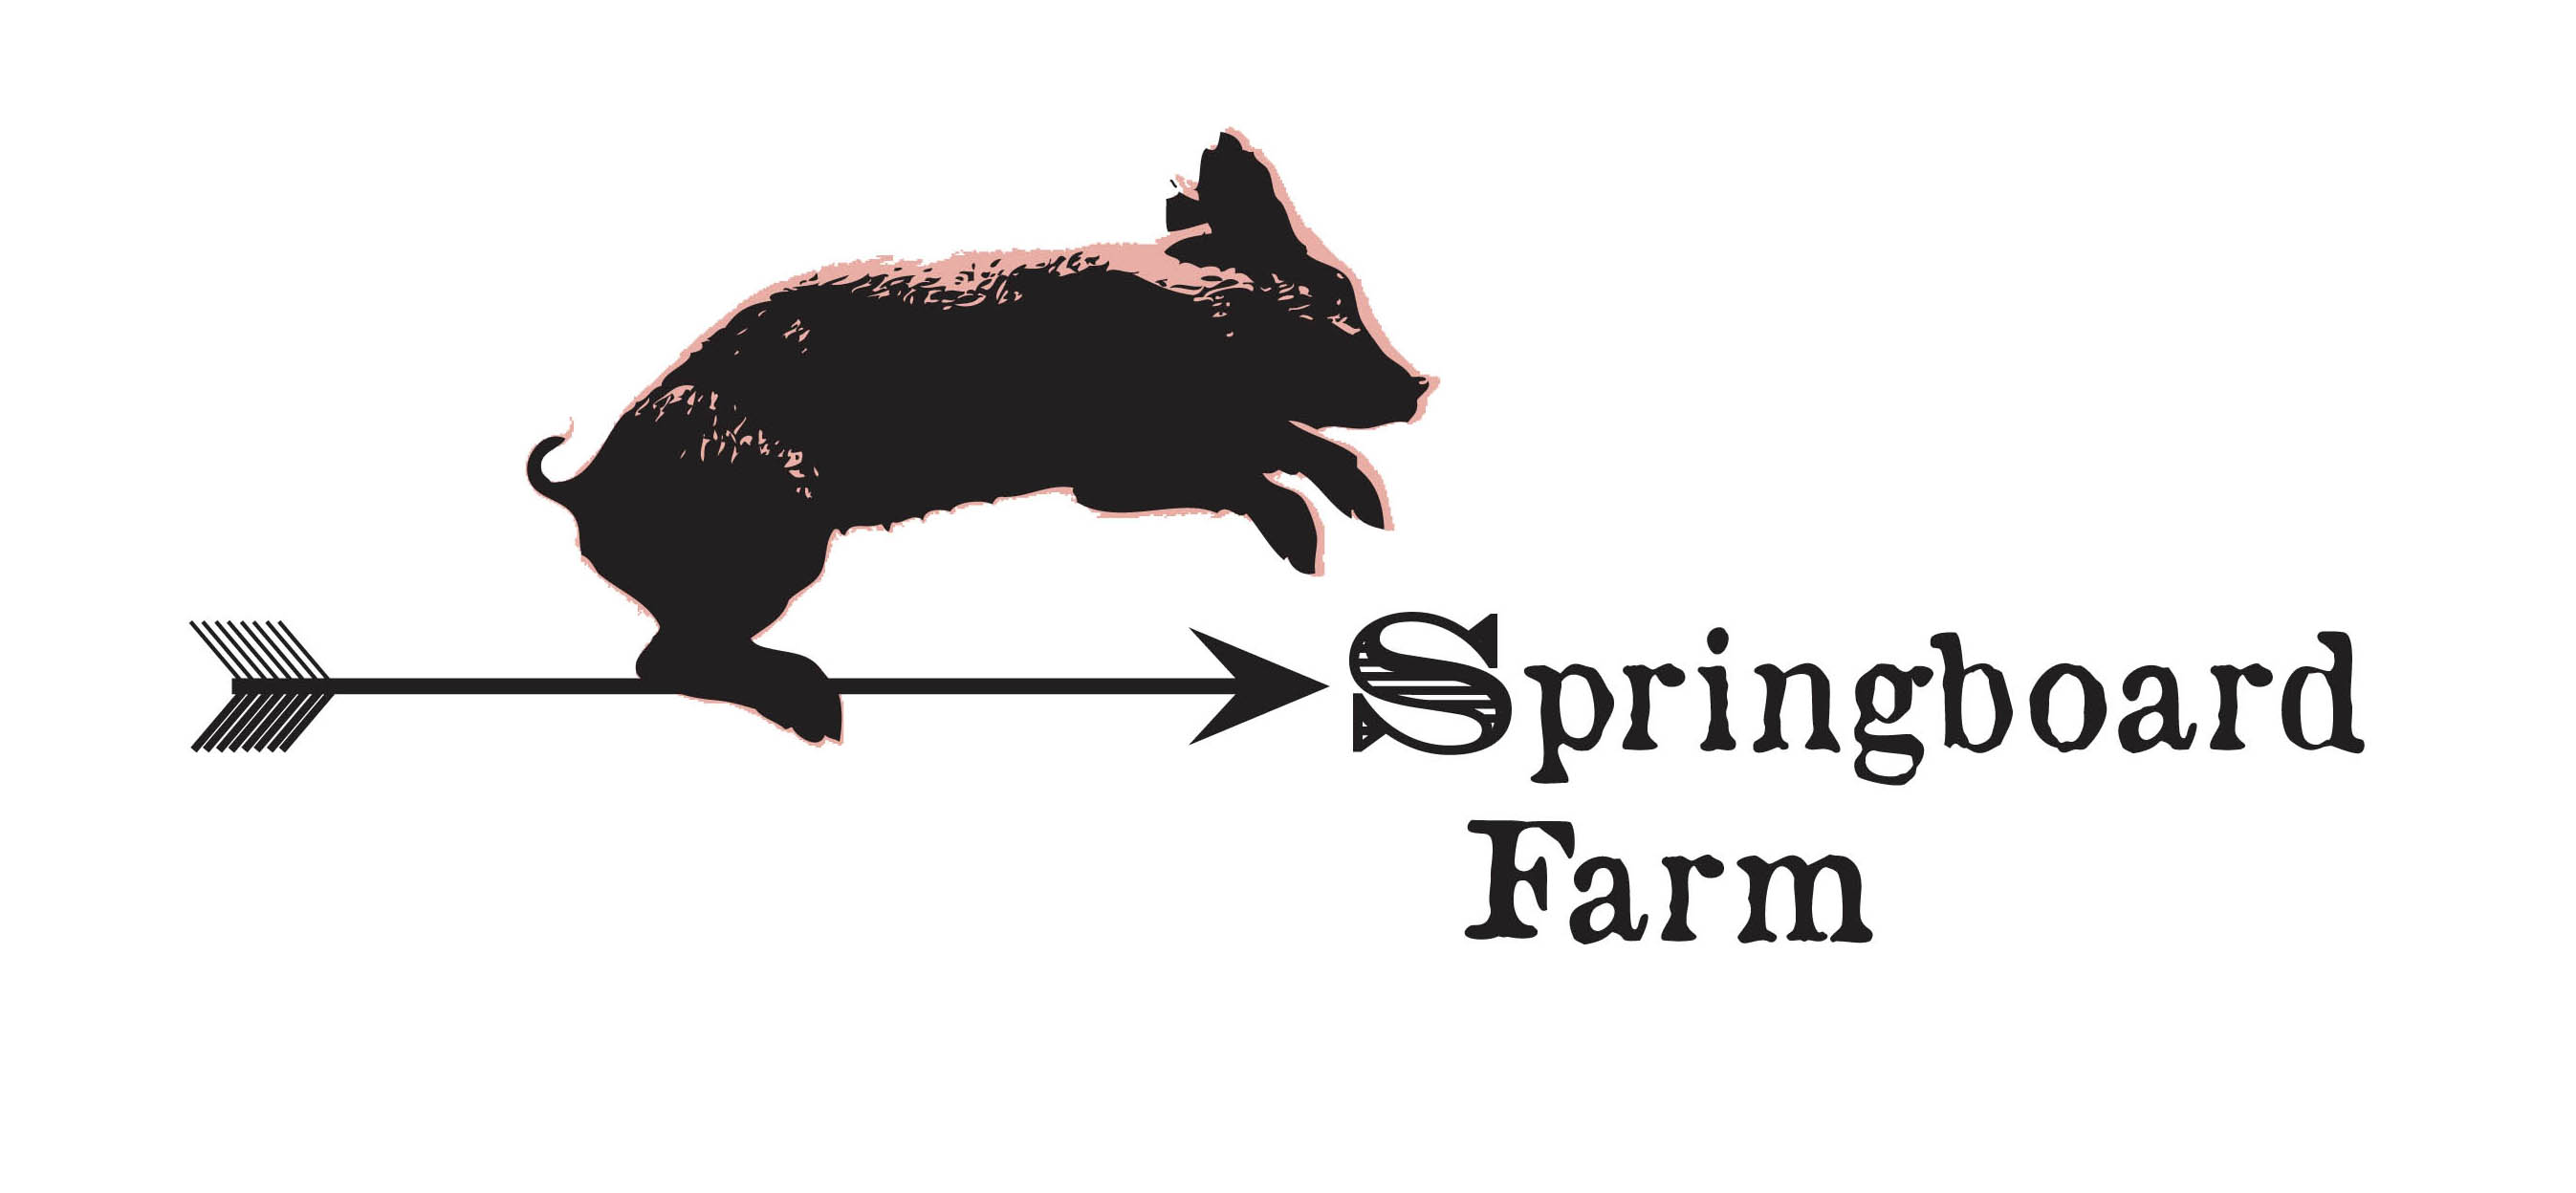 Springboard Farm